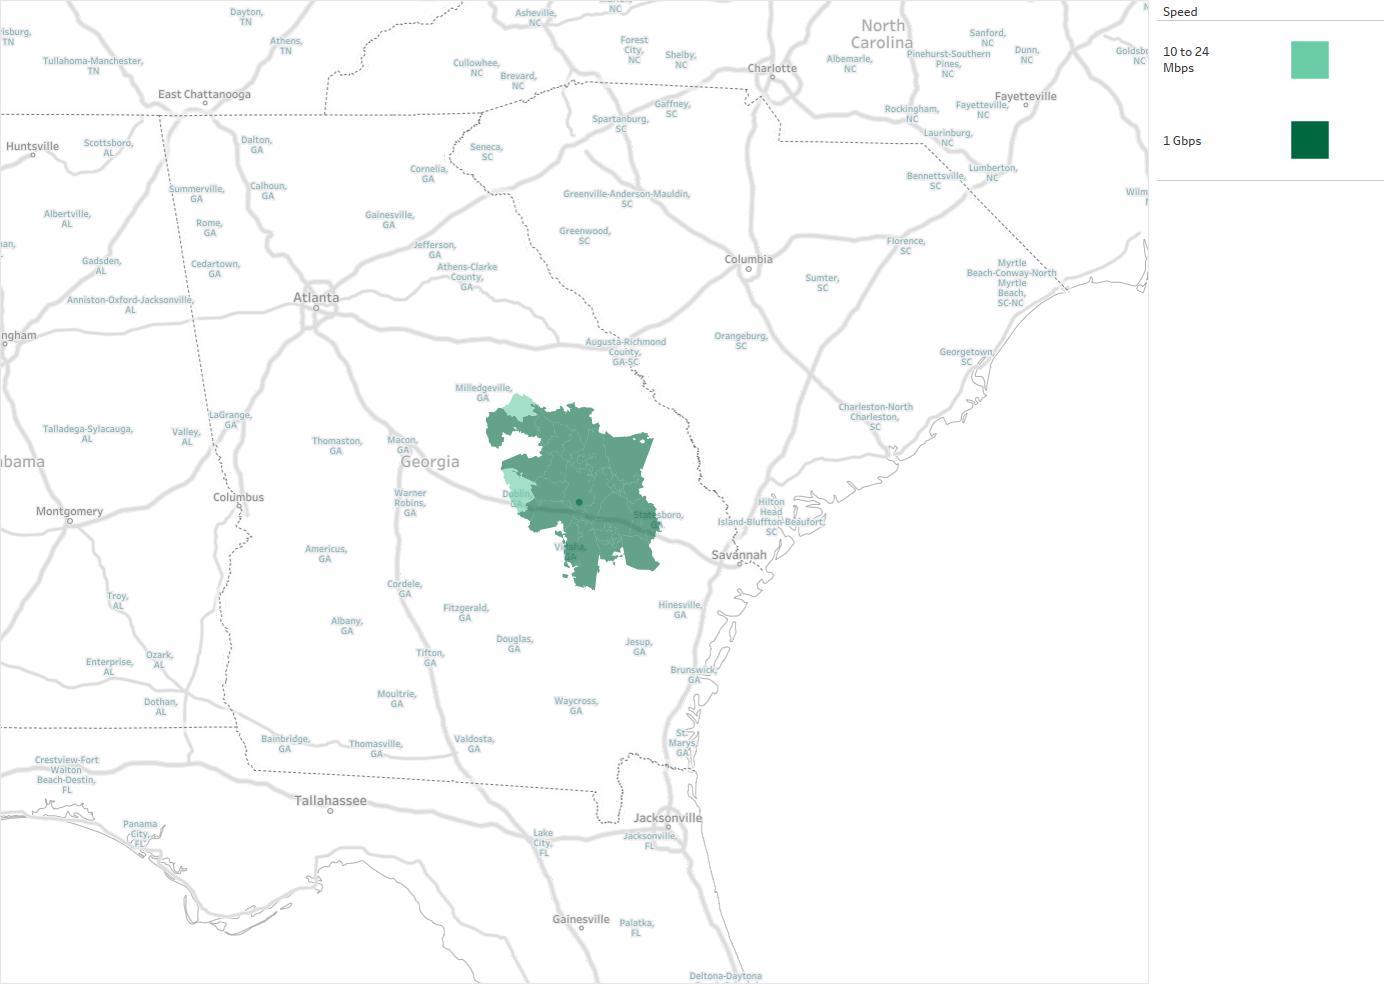 pineland telephone cooperative availability areas